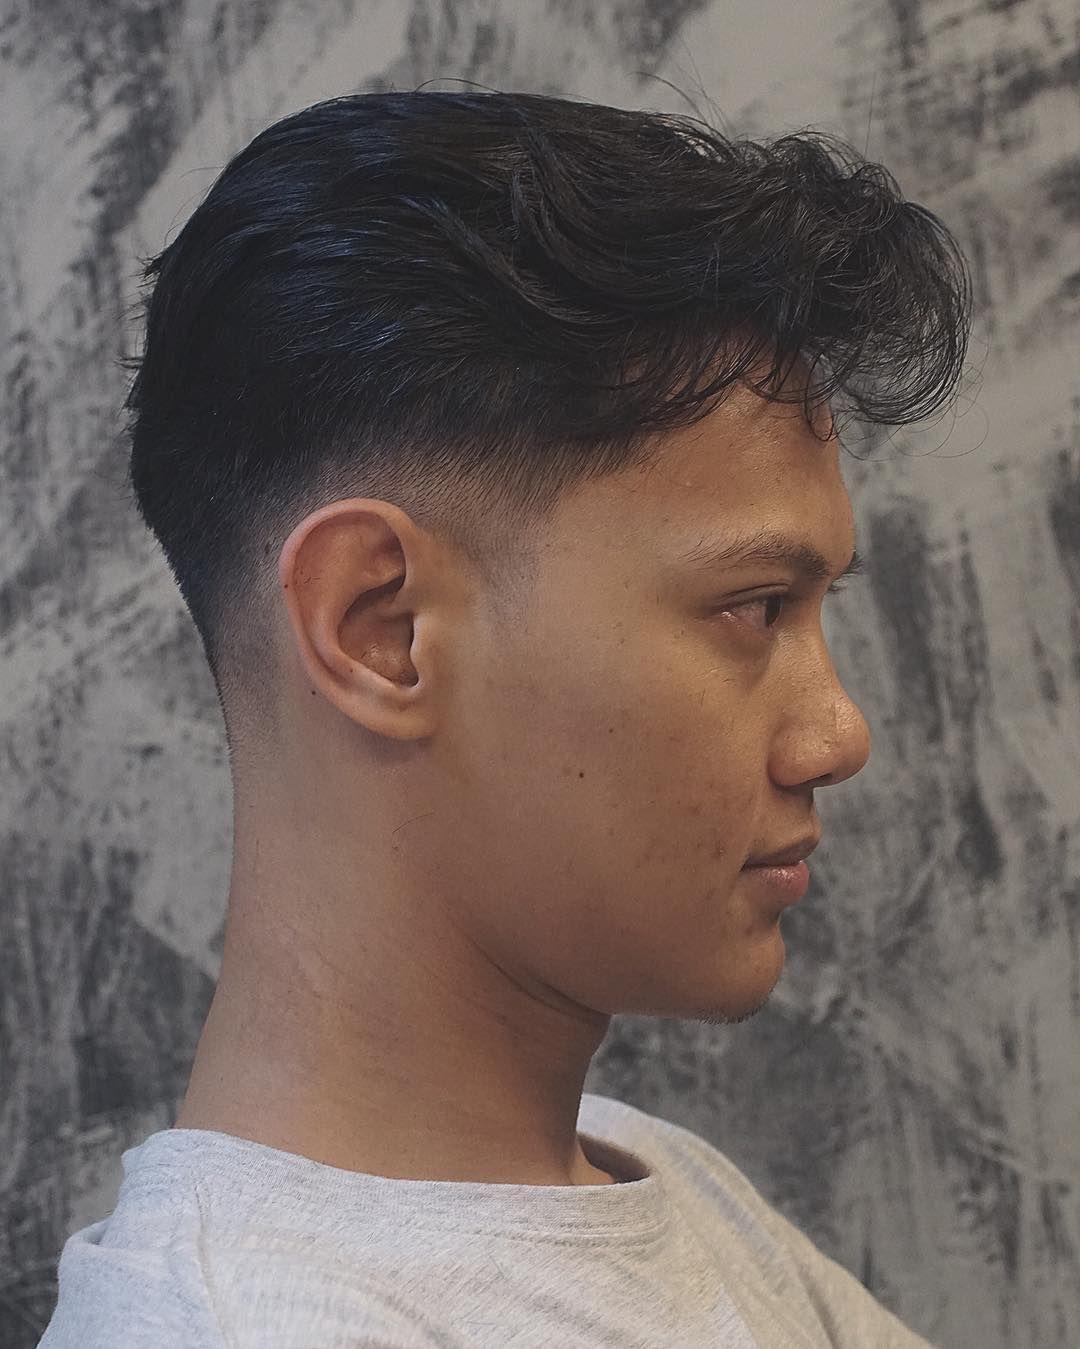 wavy hairstyles for asian men | asian men hairstyles | asian